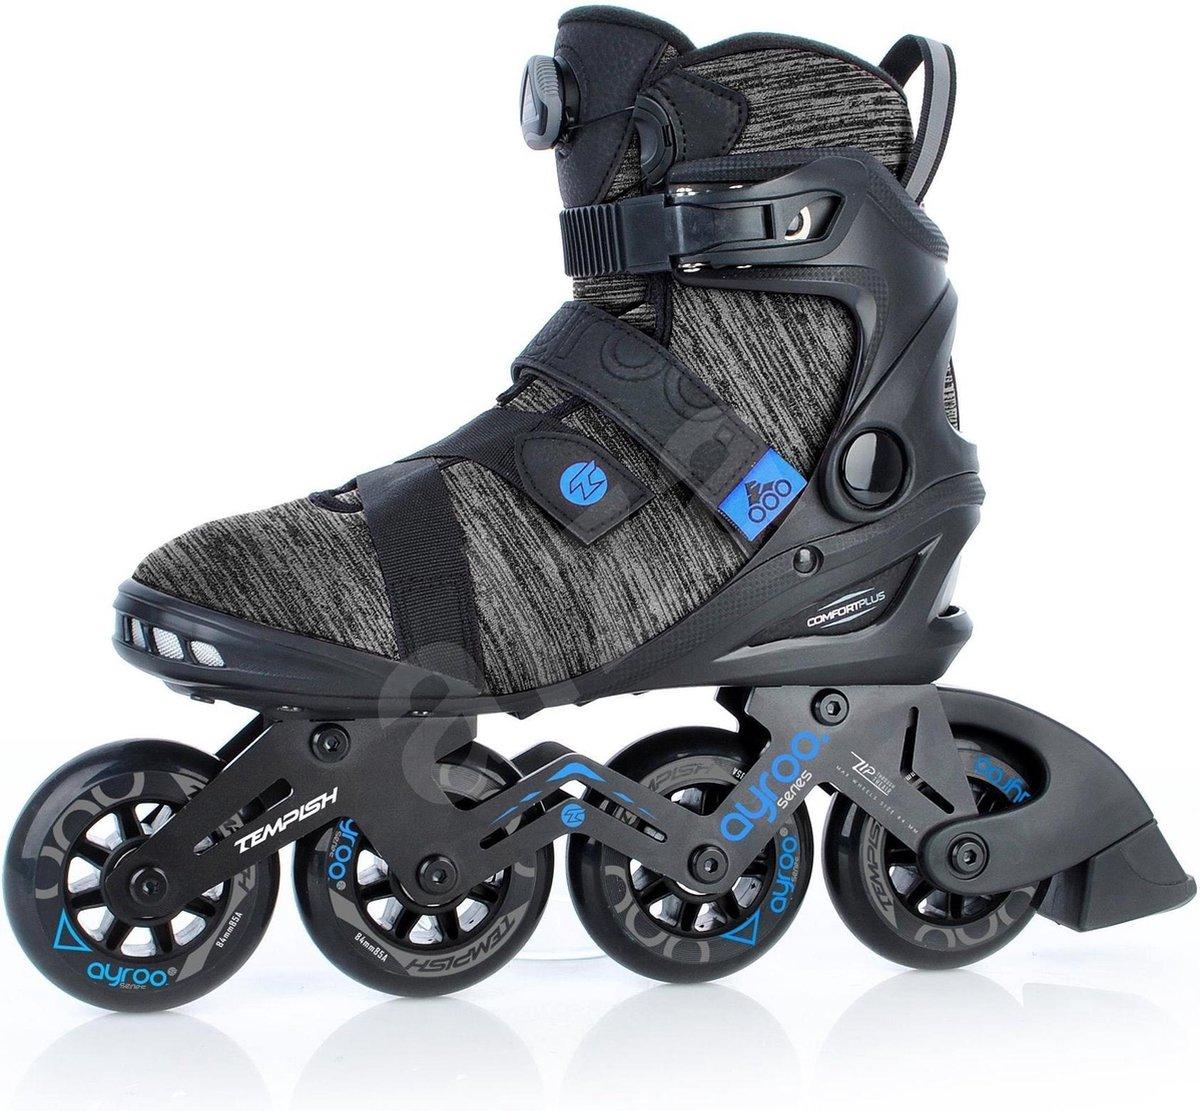 Tempish Inline skate Ayroo Top 84 Zwart- Blauw - Maat 44